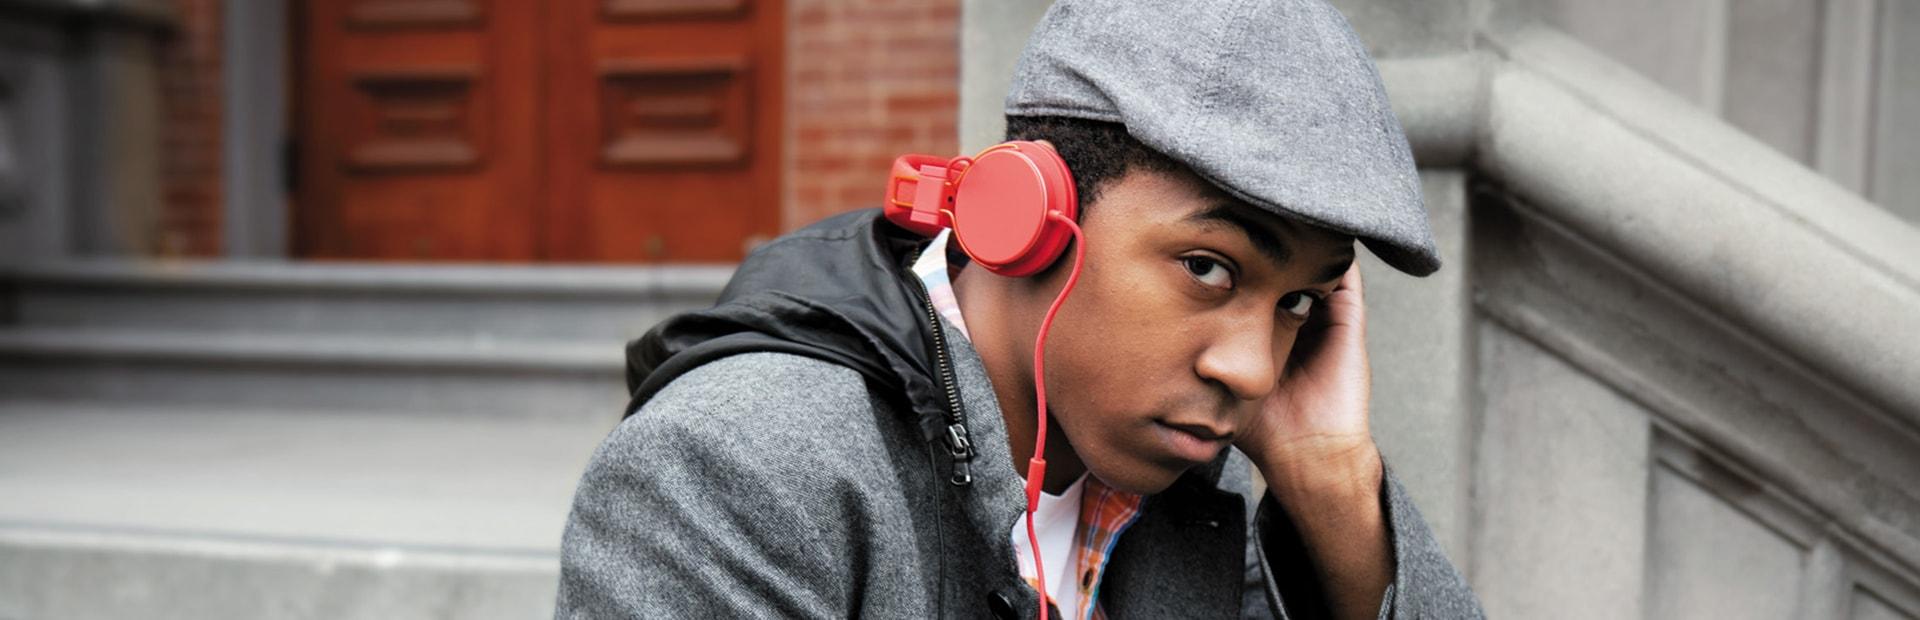 Man listening to Microsoft Groove music on red headphones